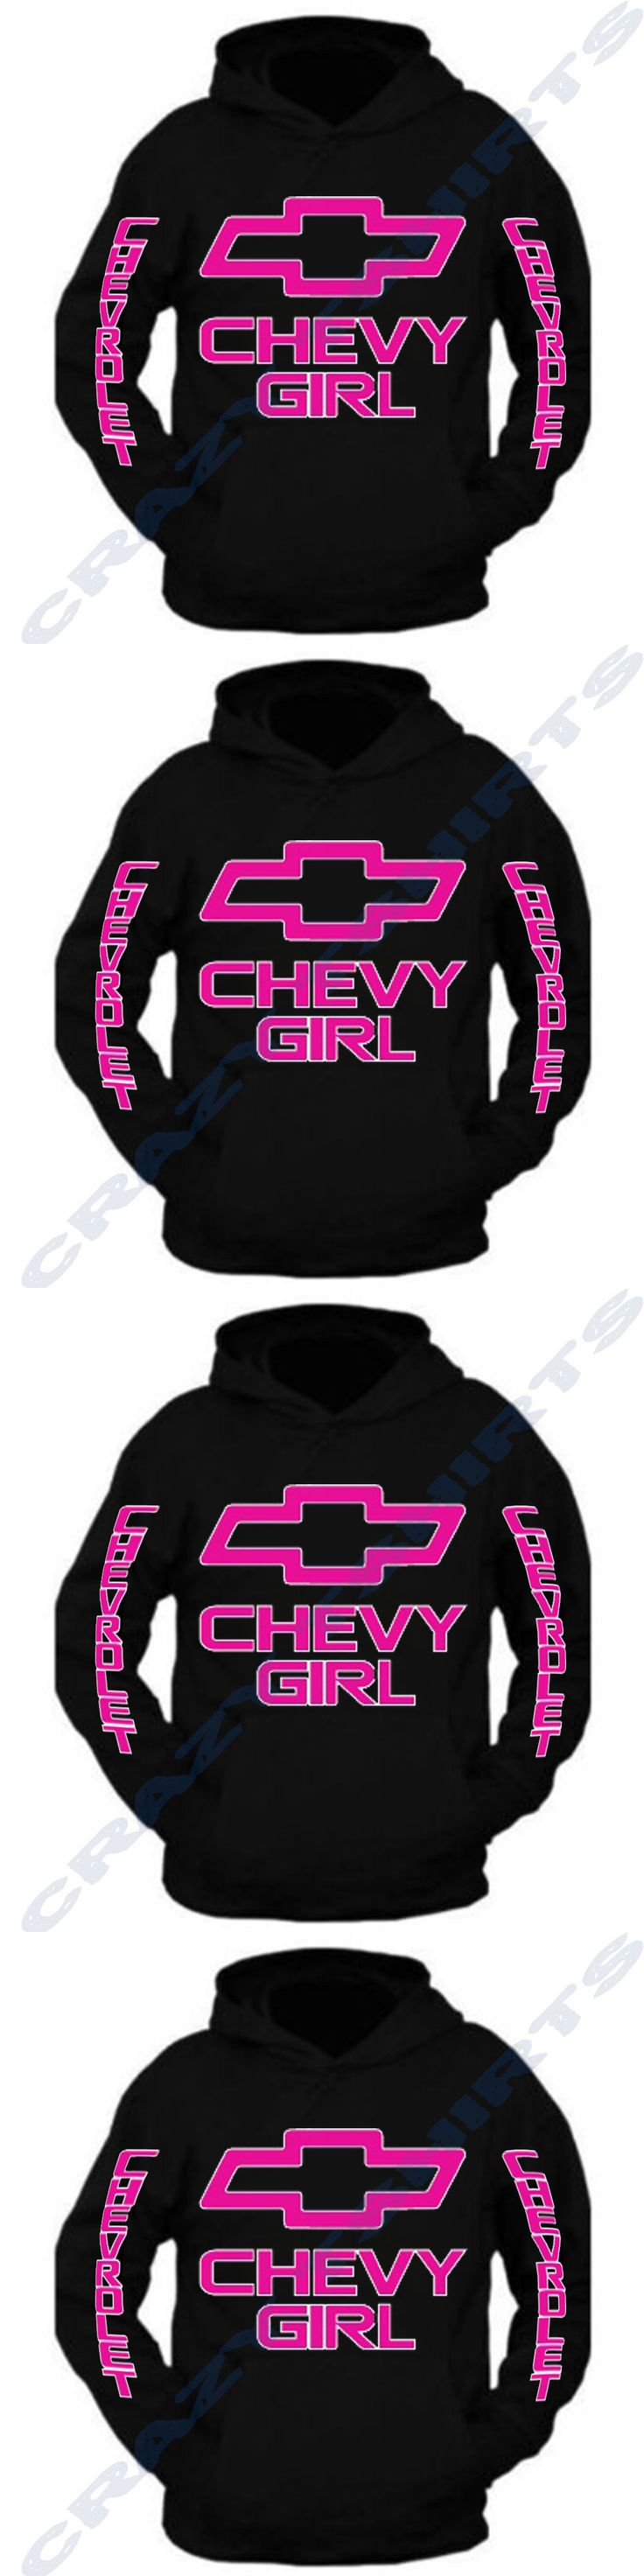 Sweatshirts hoodies 155194 new duramax chevrolet pink chevy d chest and arm hoodie sweatshirt s